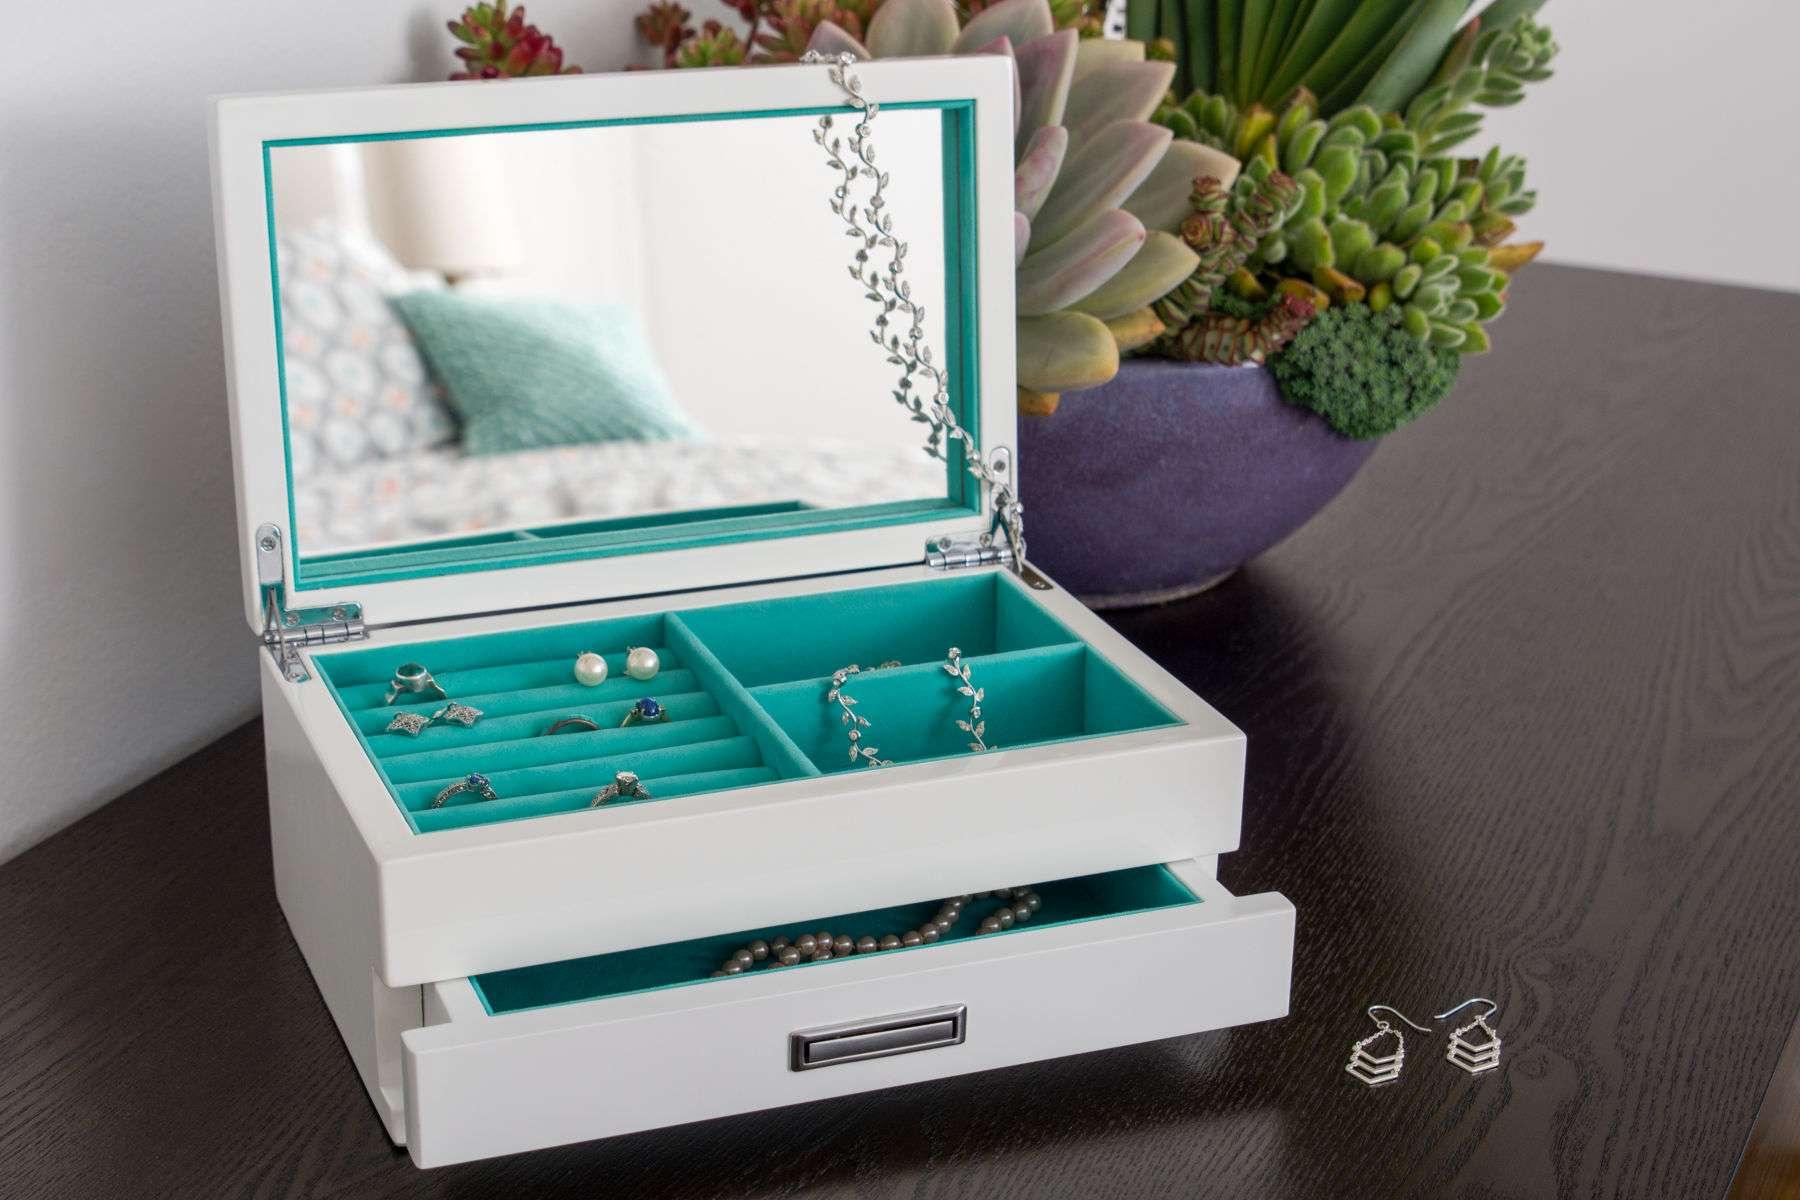 1luft_jewelrybox_6_4b.jpg